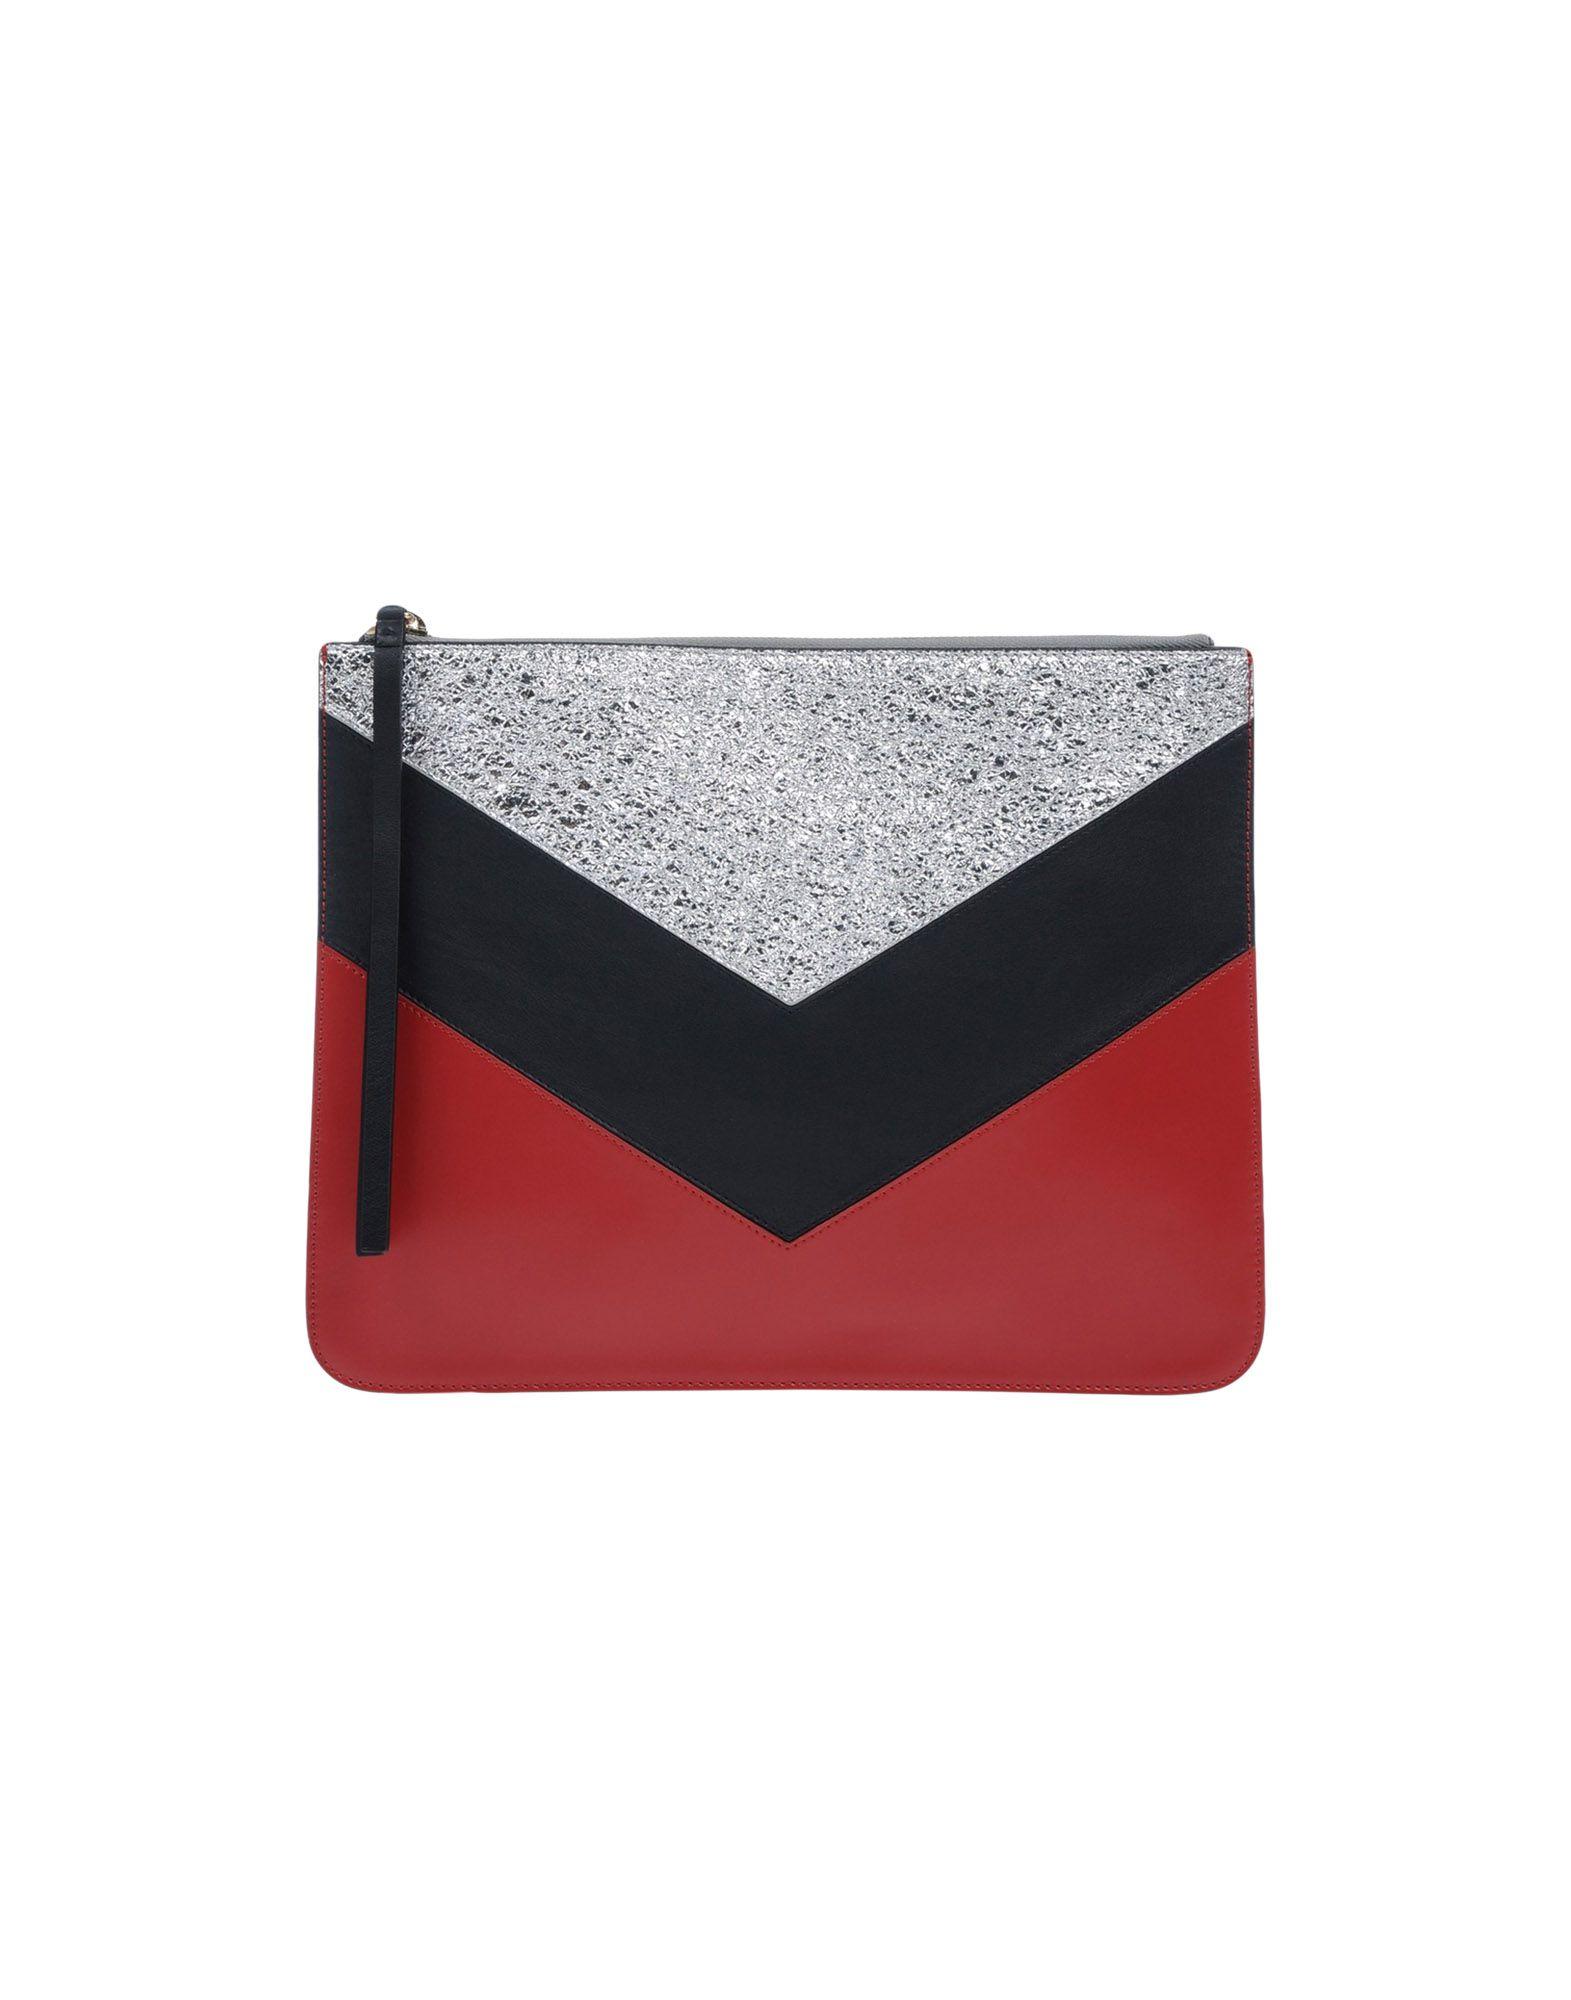 HILFIGER COLLECTION Сумка на руку versace collection сумка на руку